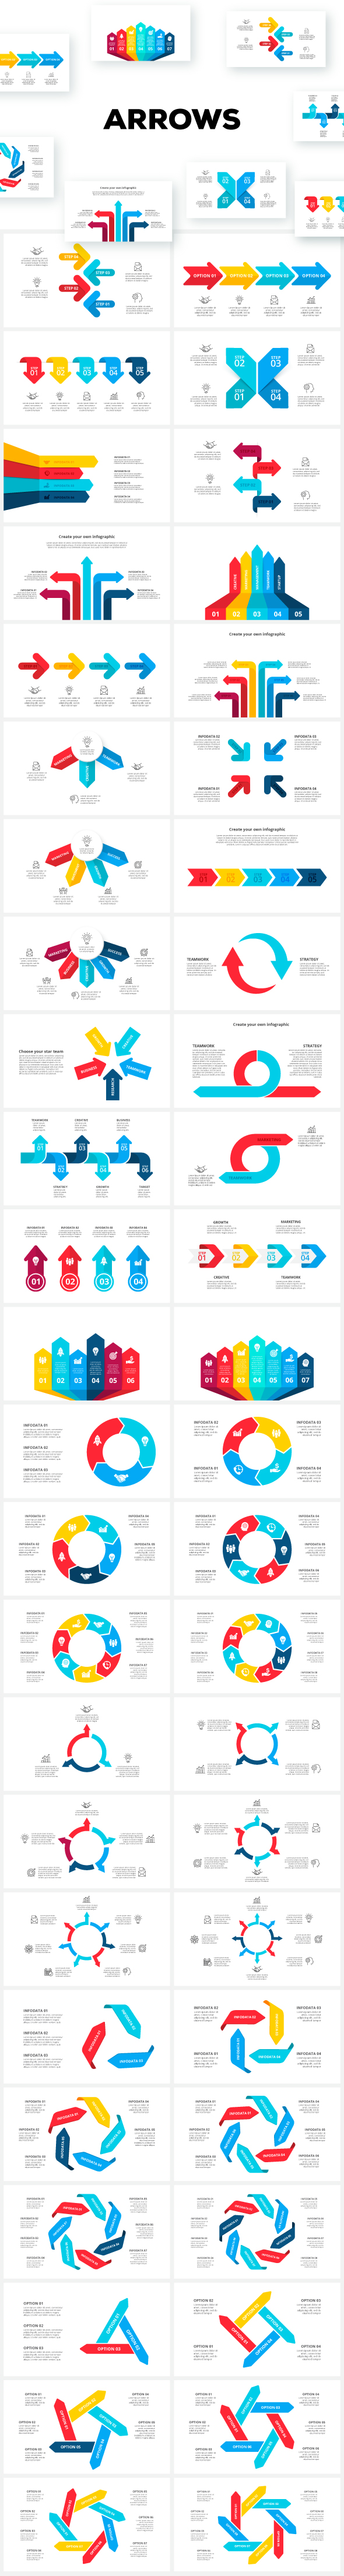 Multipurpose Infographics PowerPoint Templates v.5.0 - 159